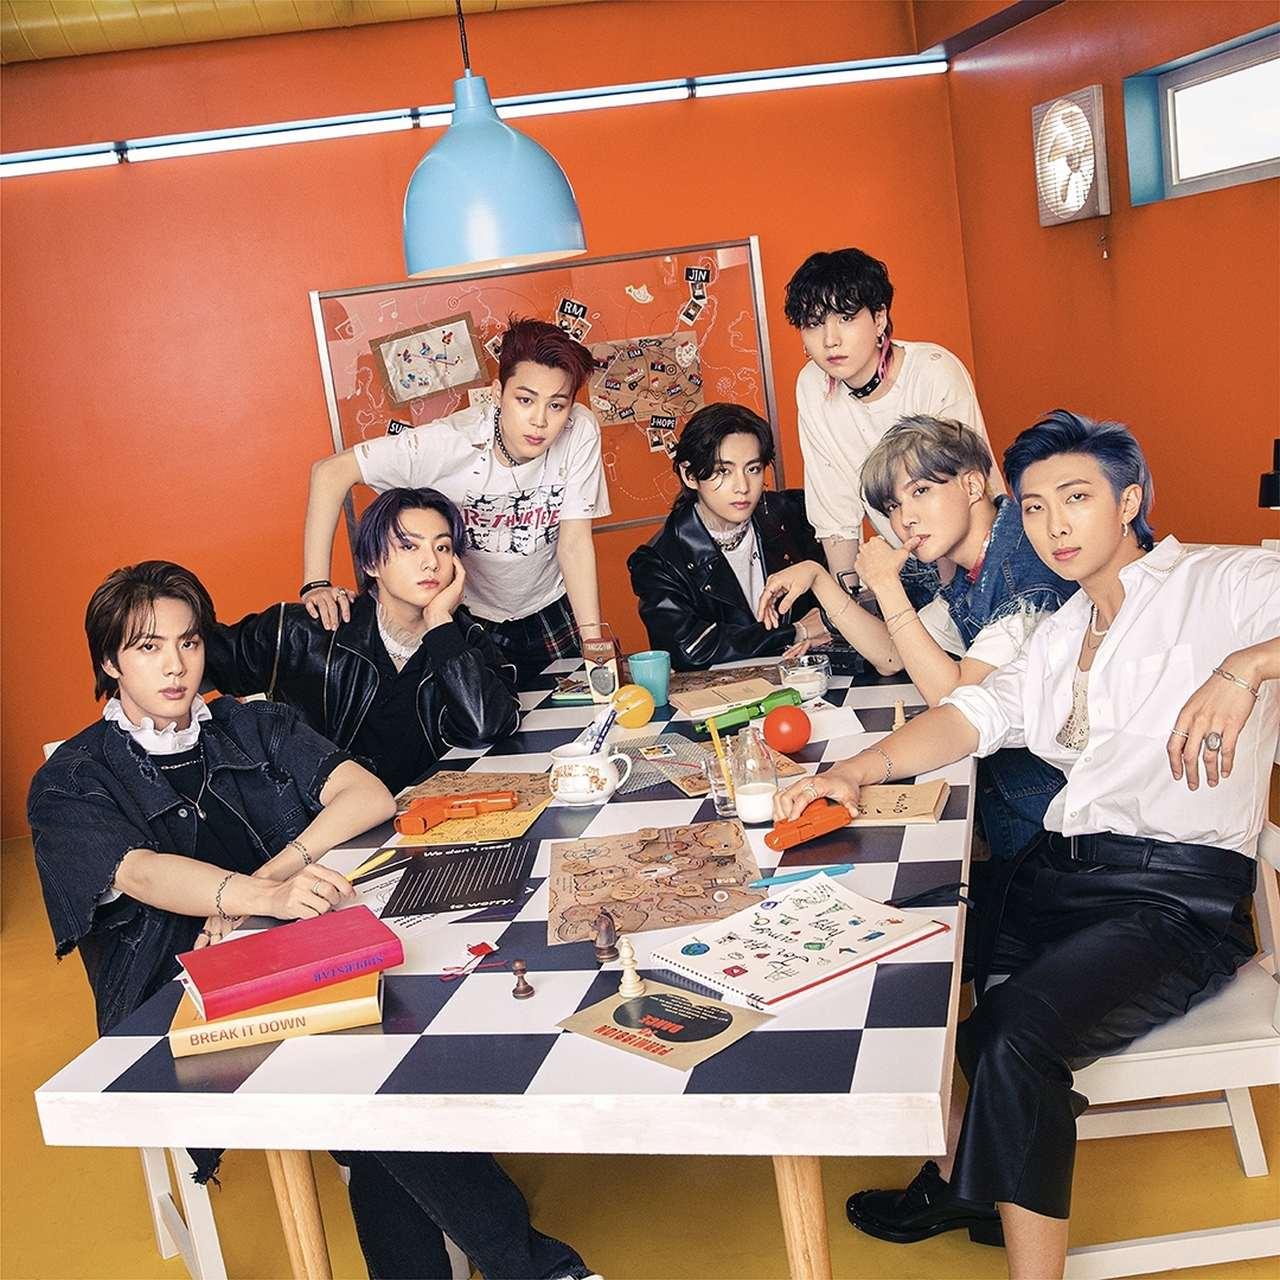 BTS vai estrelar desfile da Louis Vuitton pela primeira vez; saiba como assistir